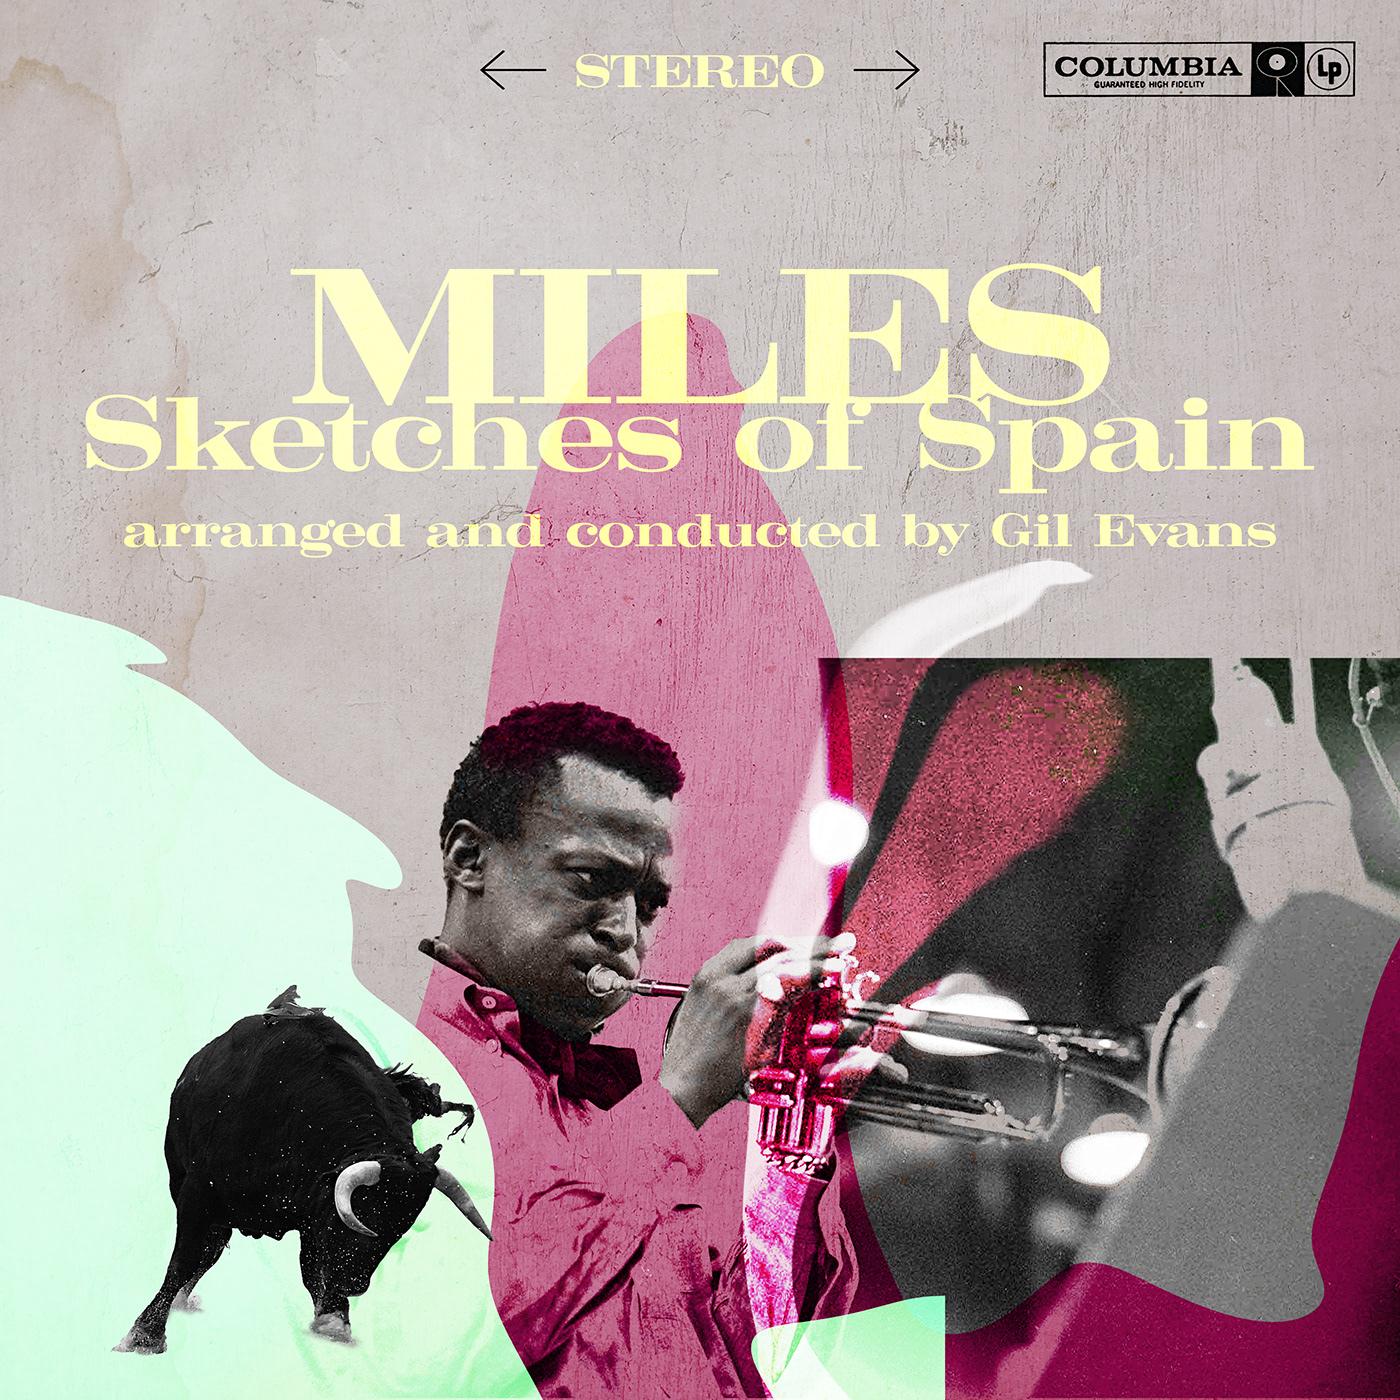 black colors cover fresh graphic design  jazz Miles Davis new photo sketches